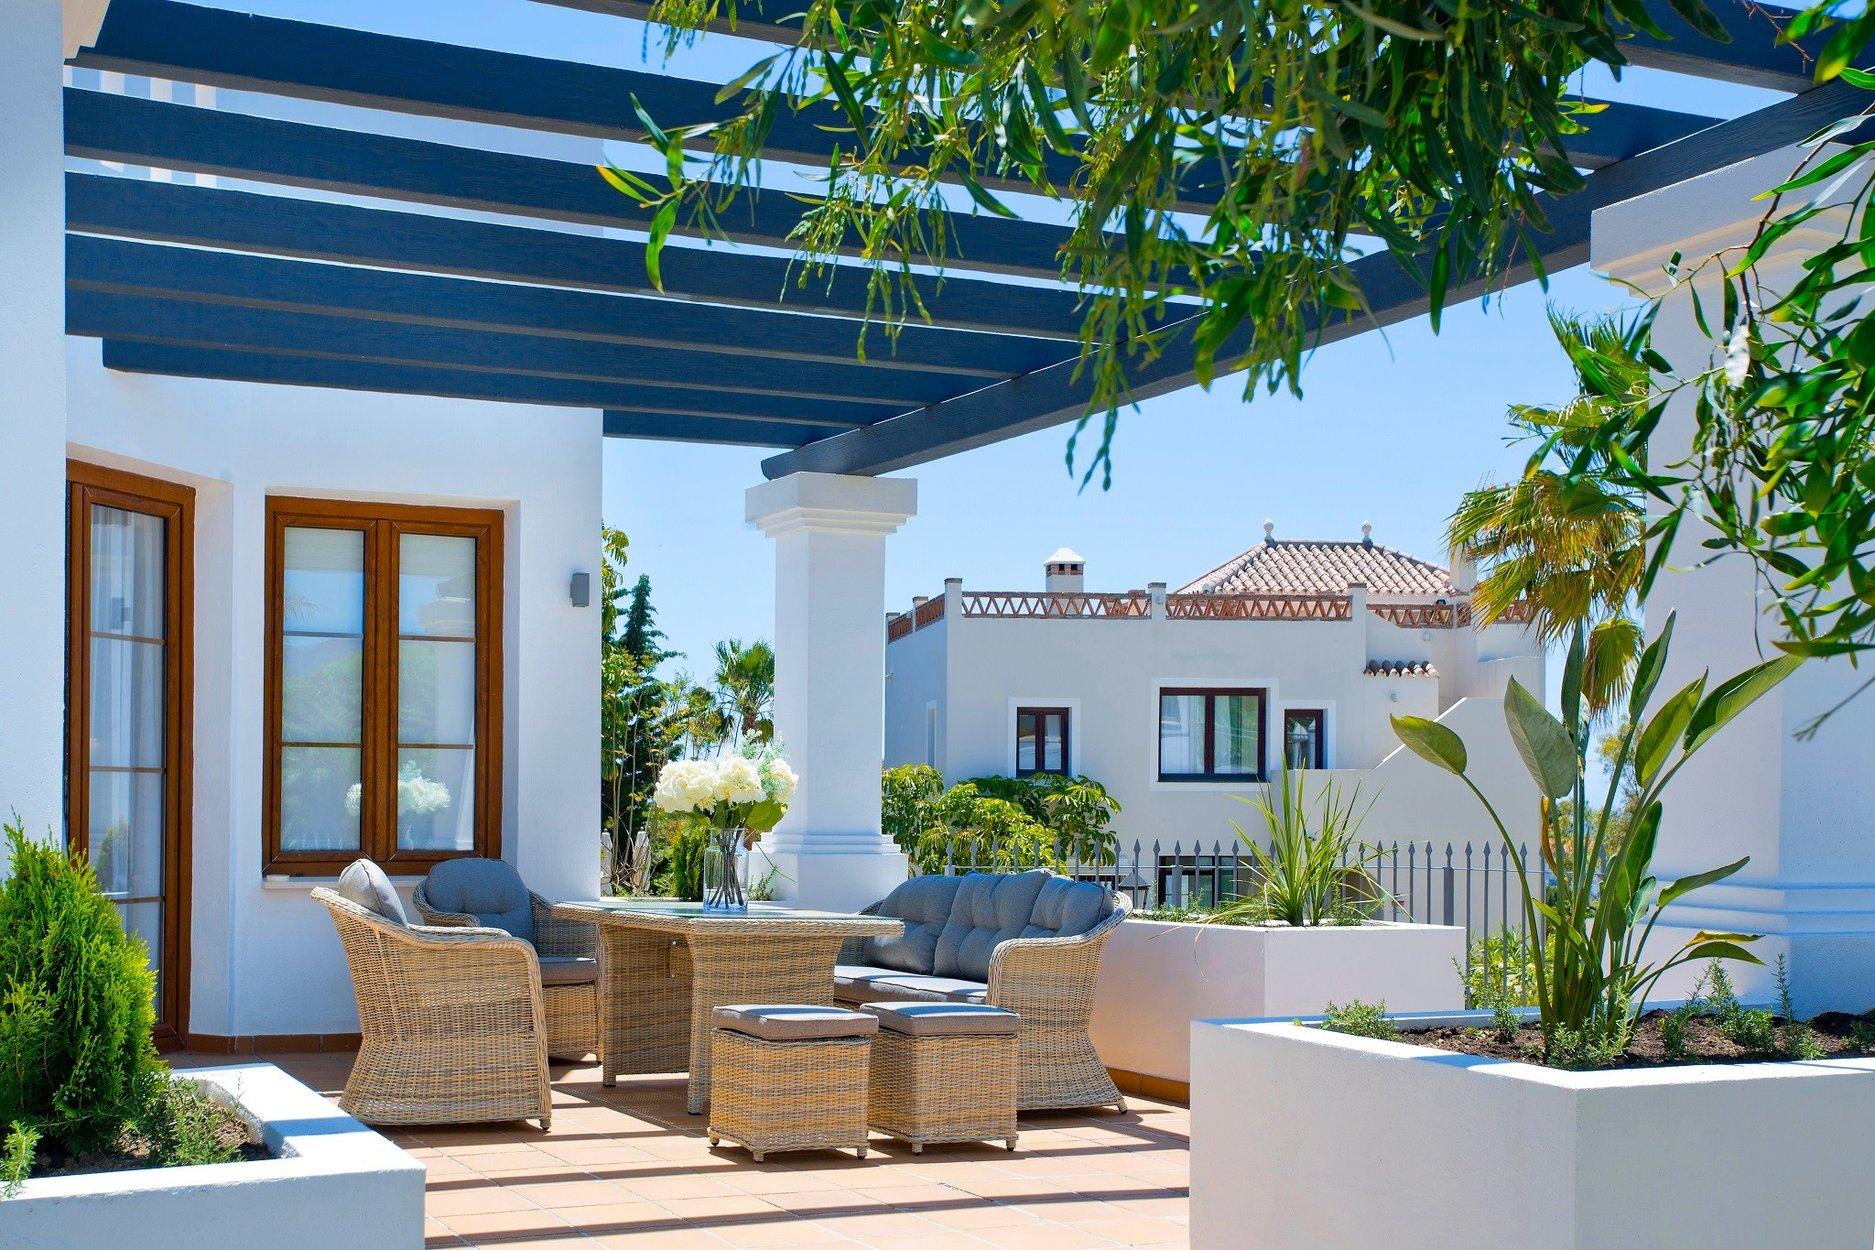 3-bed- villa for Sale in New Golden Mile